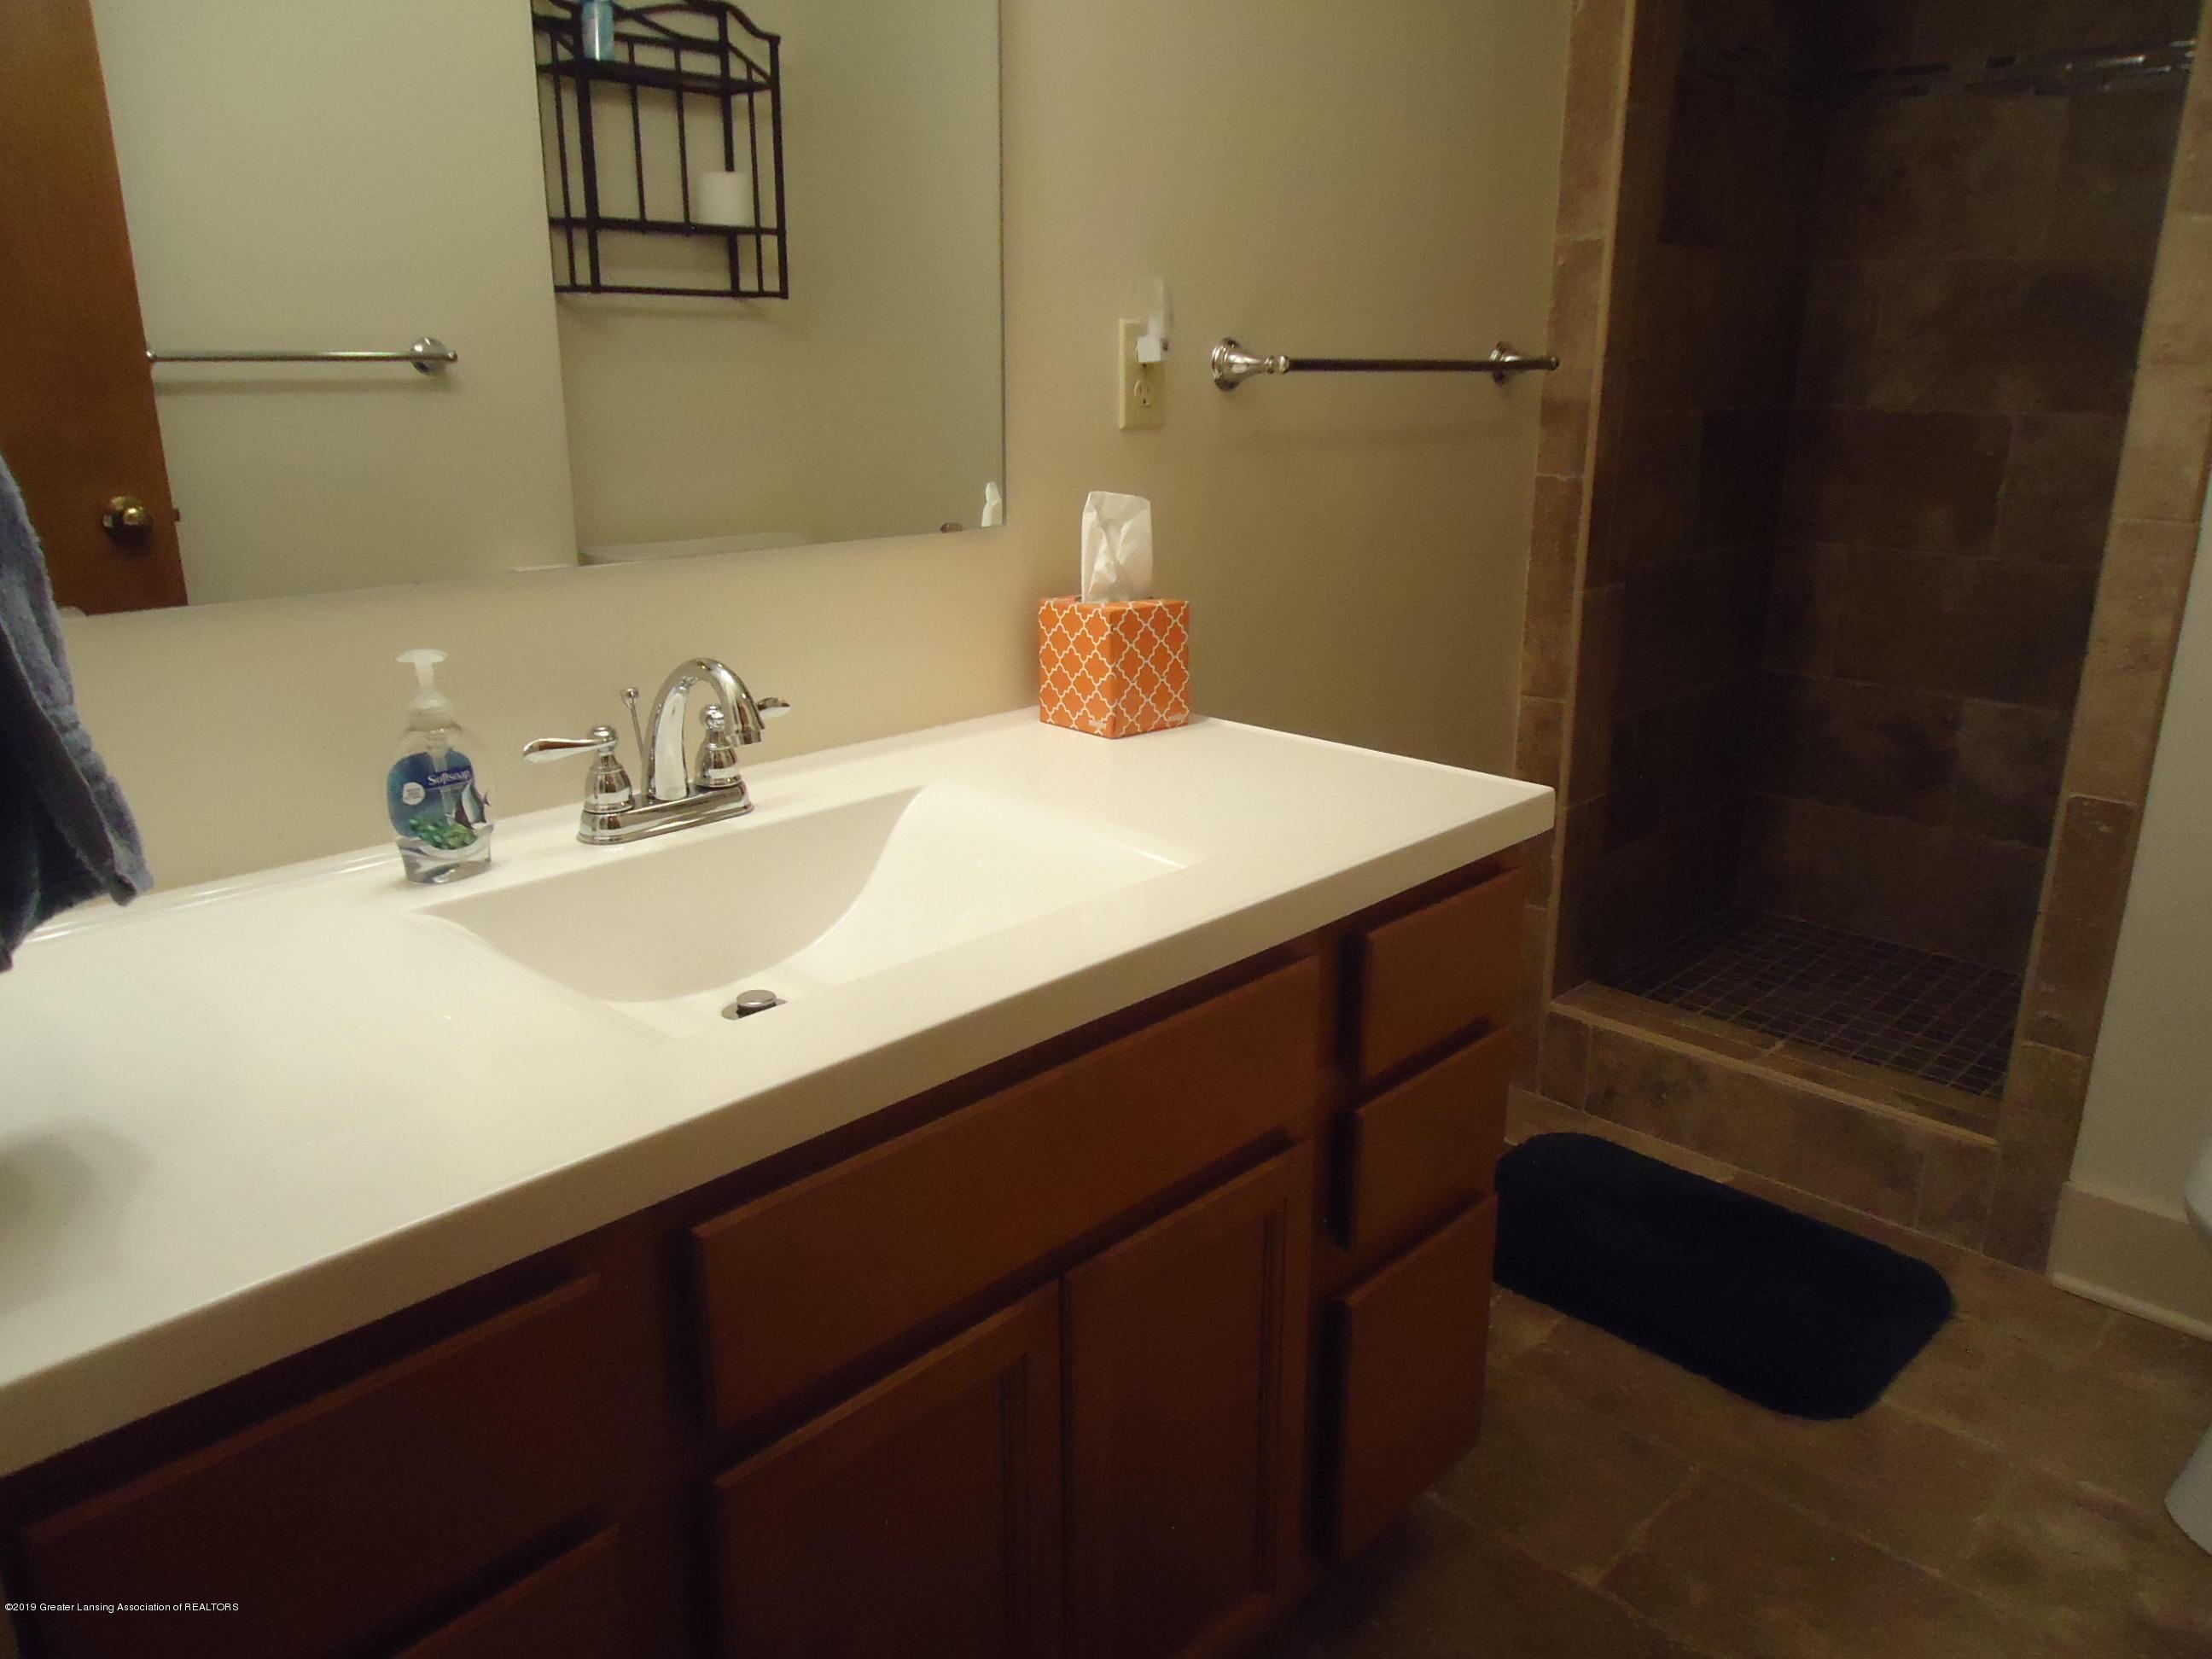 309 E Lovett St - 22 Bathroom 2 upstairs - 18